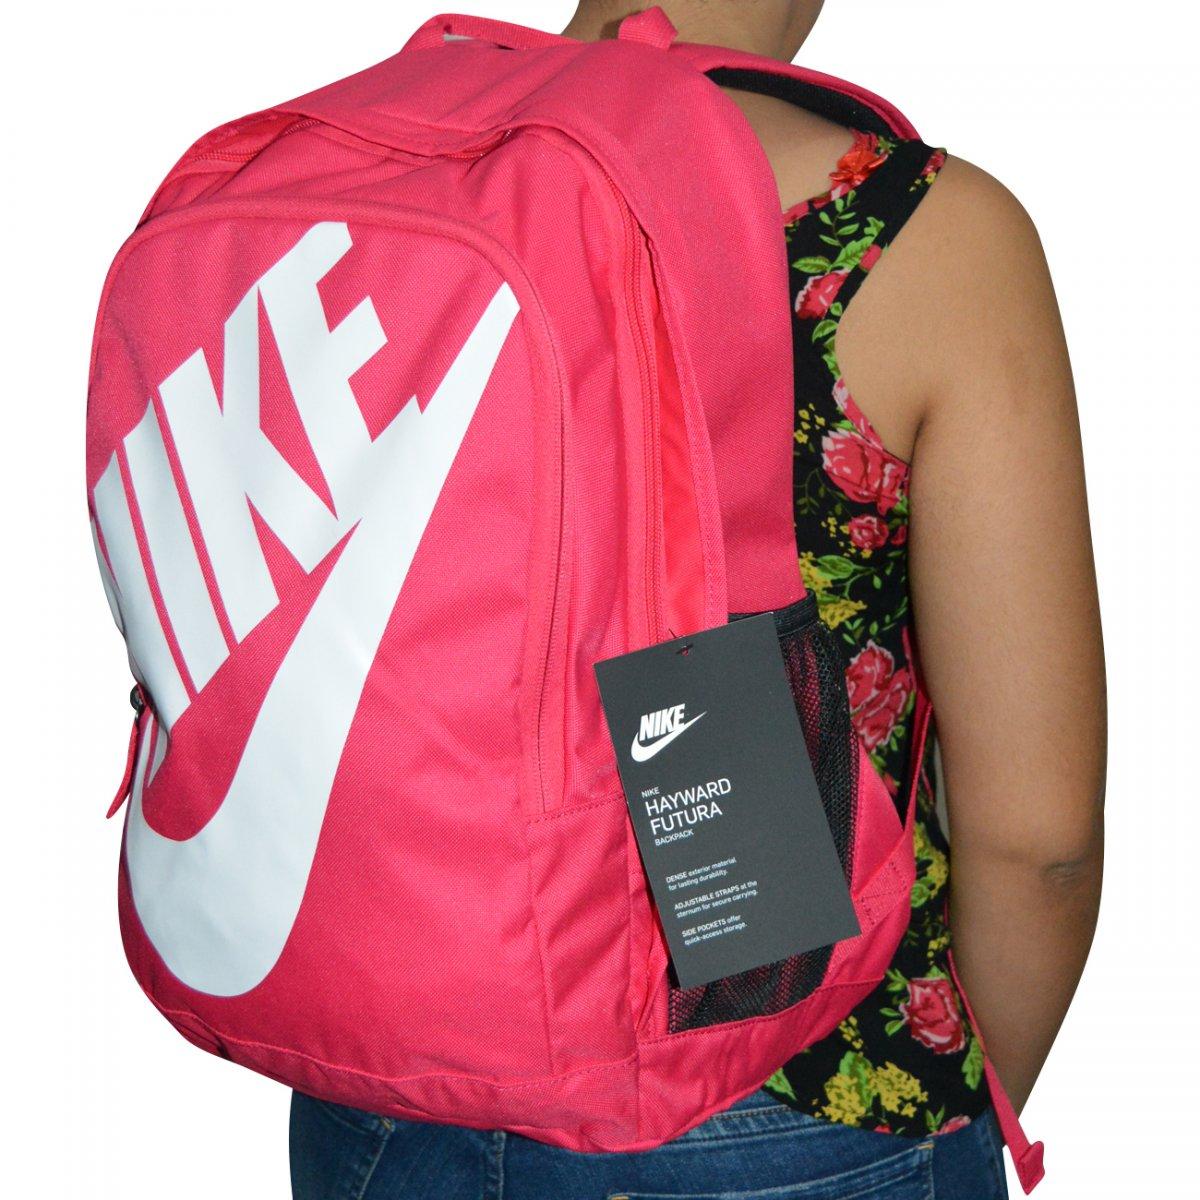 96c9974f1 Mochila Nike BA5217 BA5217-694 - Pink/branco - Chuteira Nike, Adidas.  Sandalias Femininas. Sandy Calçados